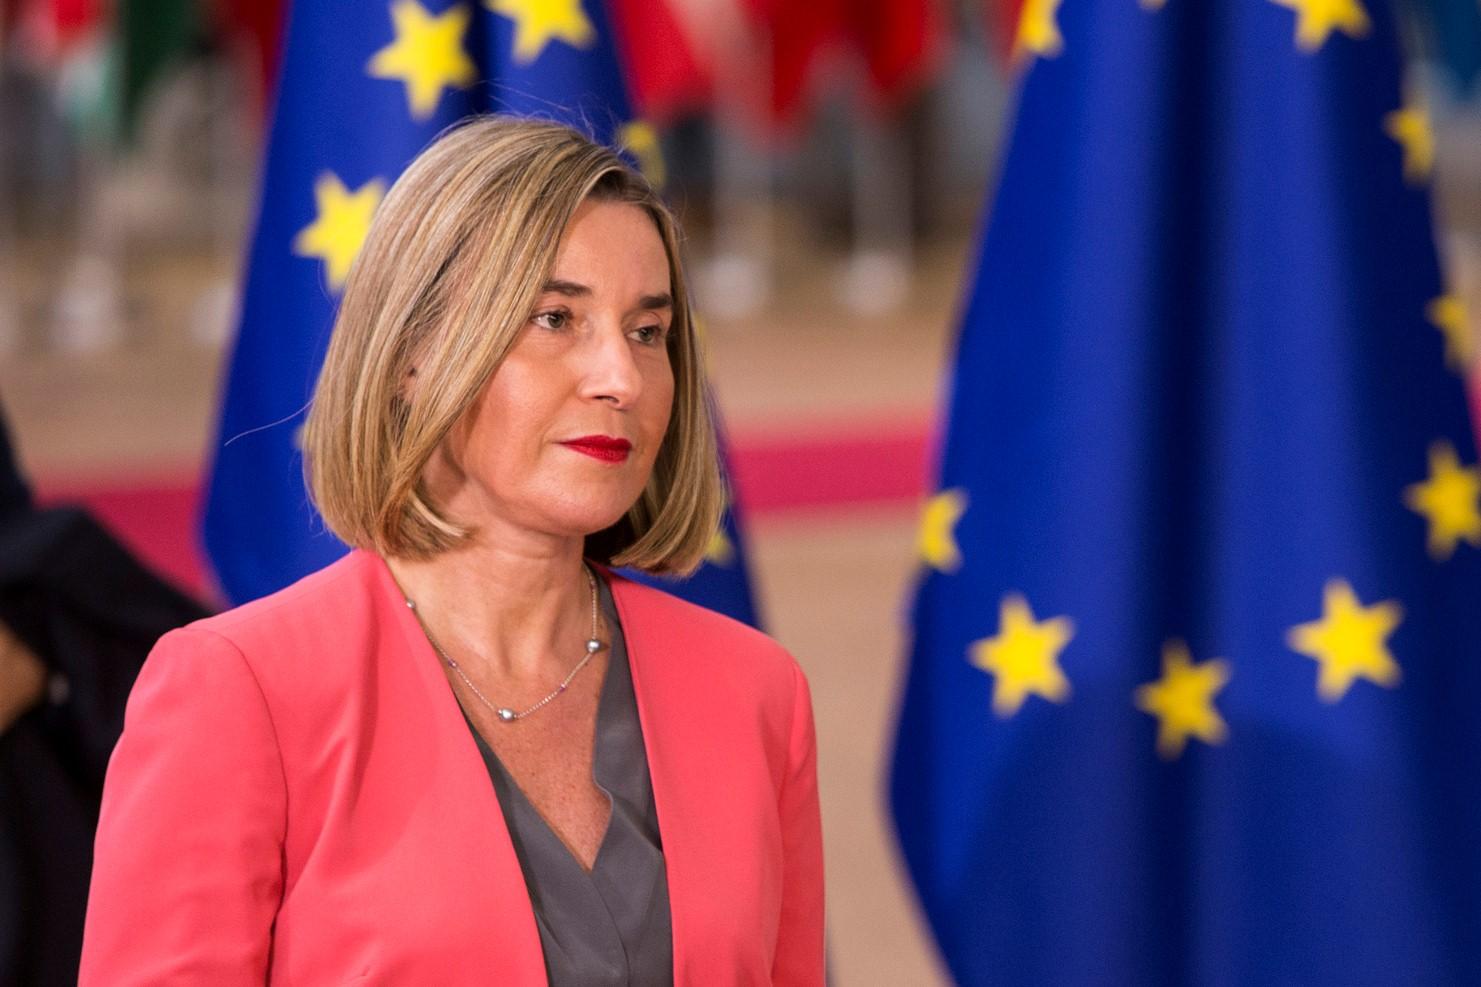 Mogherini: Η Τουρκία να σεβαστεί τα κυριαρχικά δικαιώματα της Κύπρου